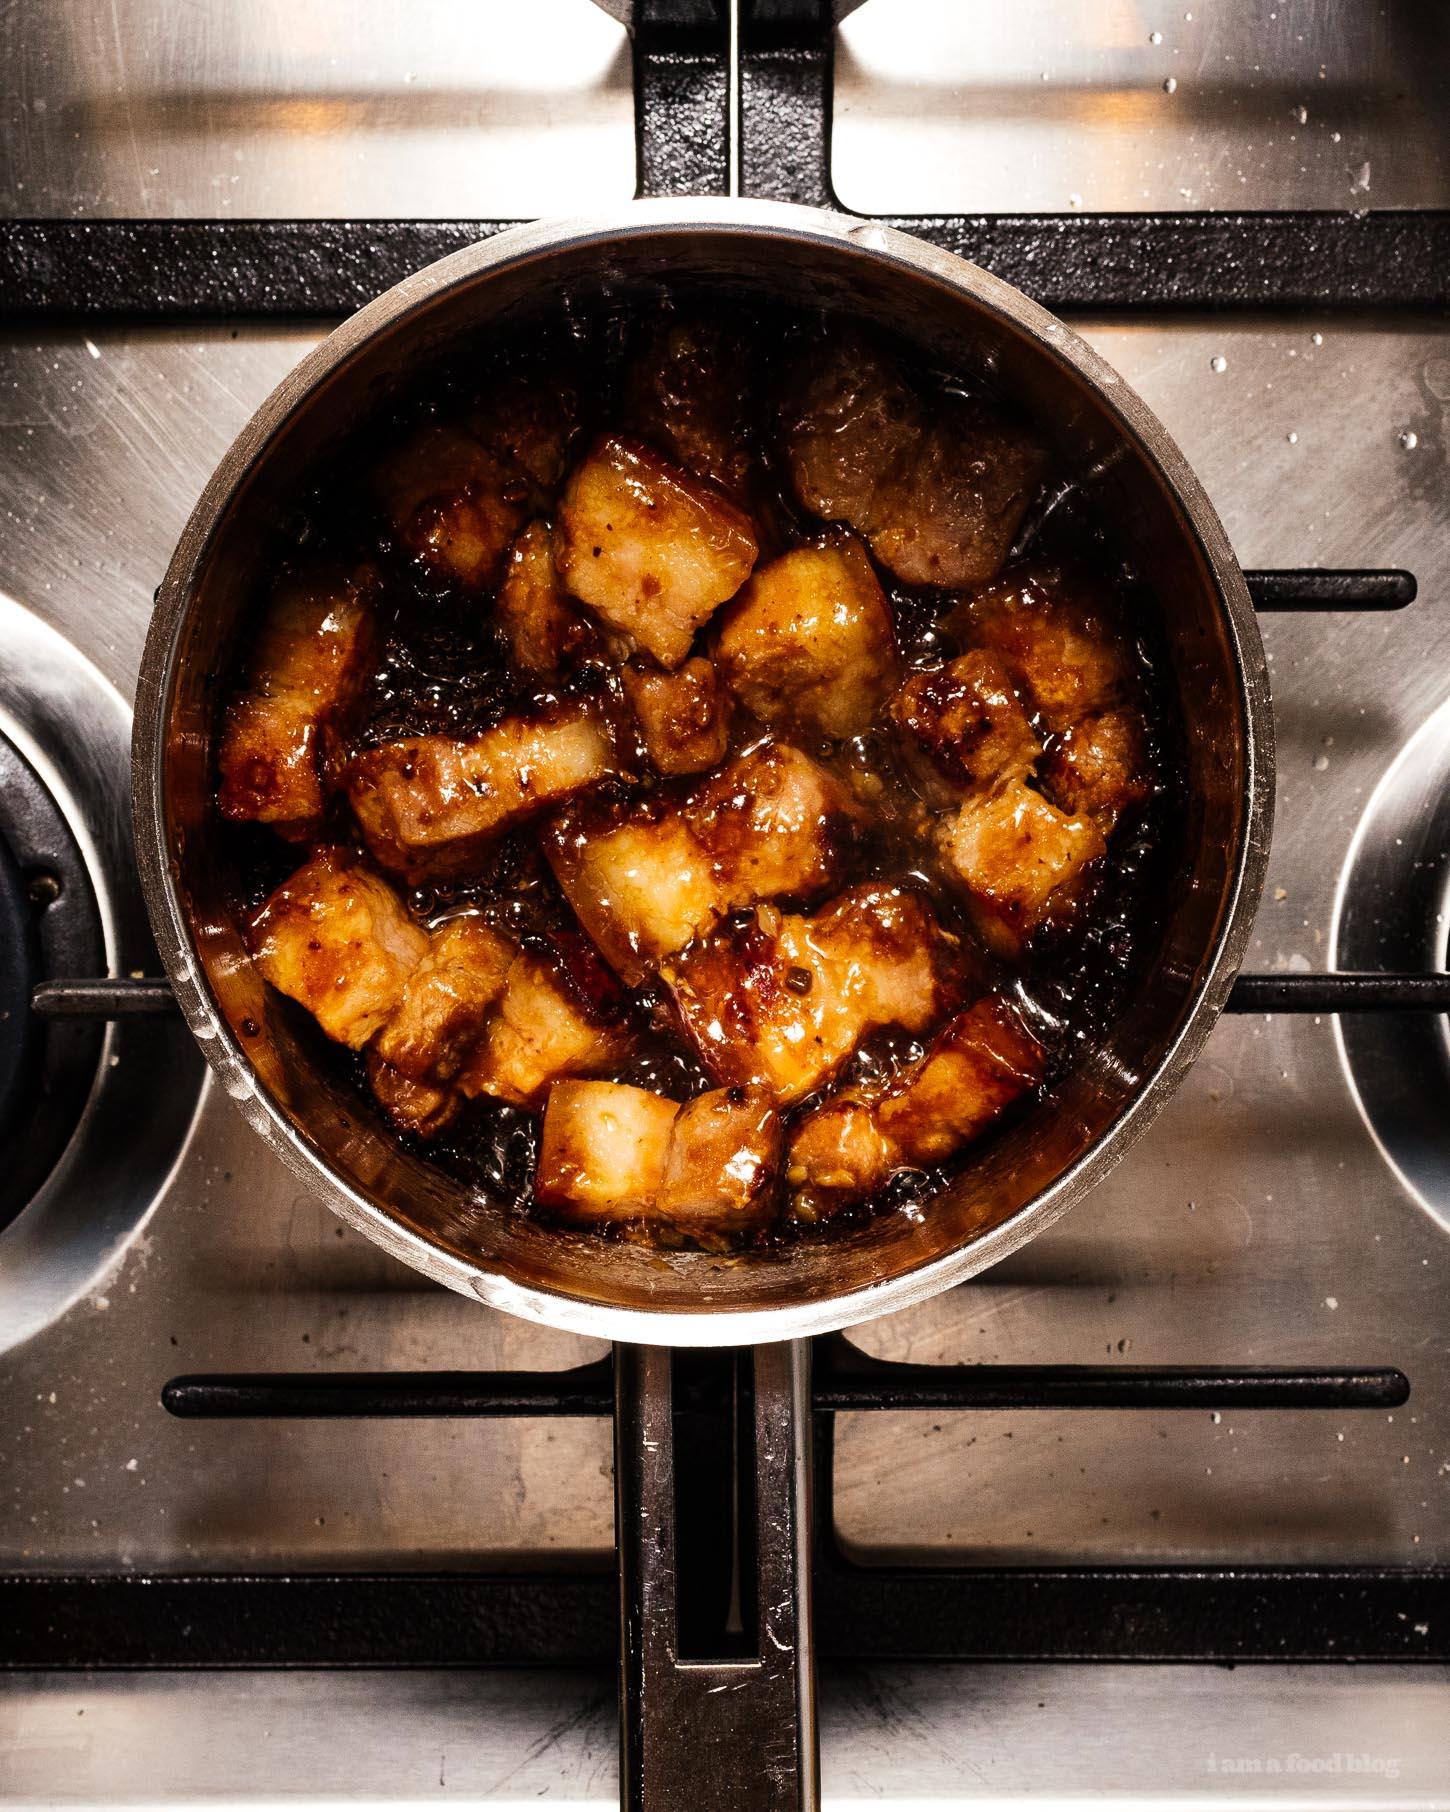 6 Ingredient Bourbon Braised Black Bean Pork Belly | www.iamafoodblog.com